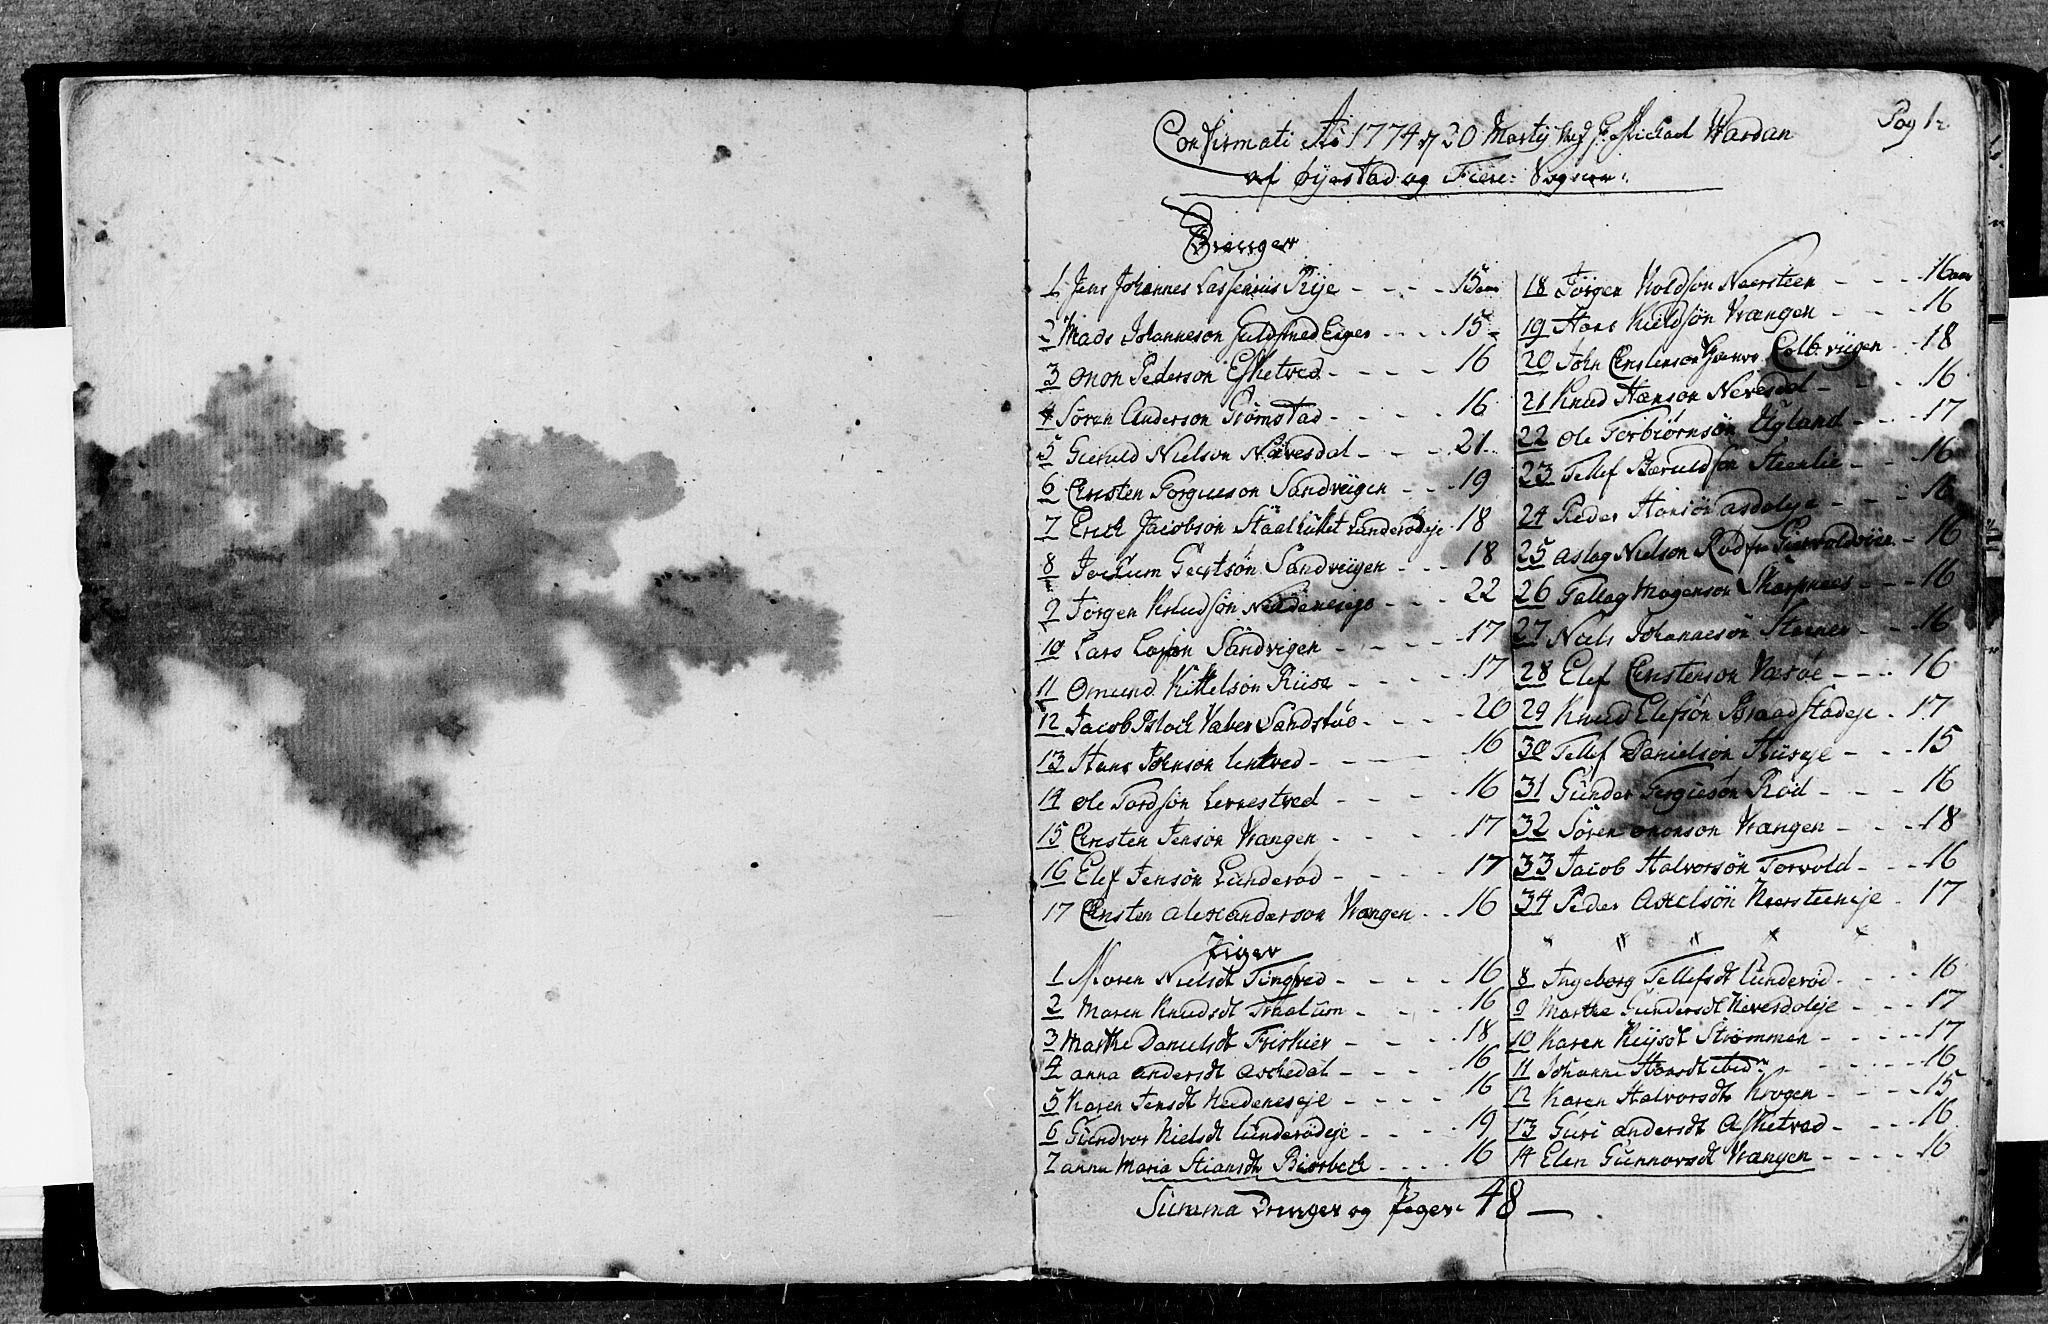 SAK, Øyestad sokneprestkontor, F/Fa/L0010: Ministerialbok nr. A 10, 1774-1810, s. 0-1